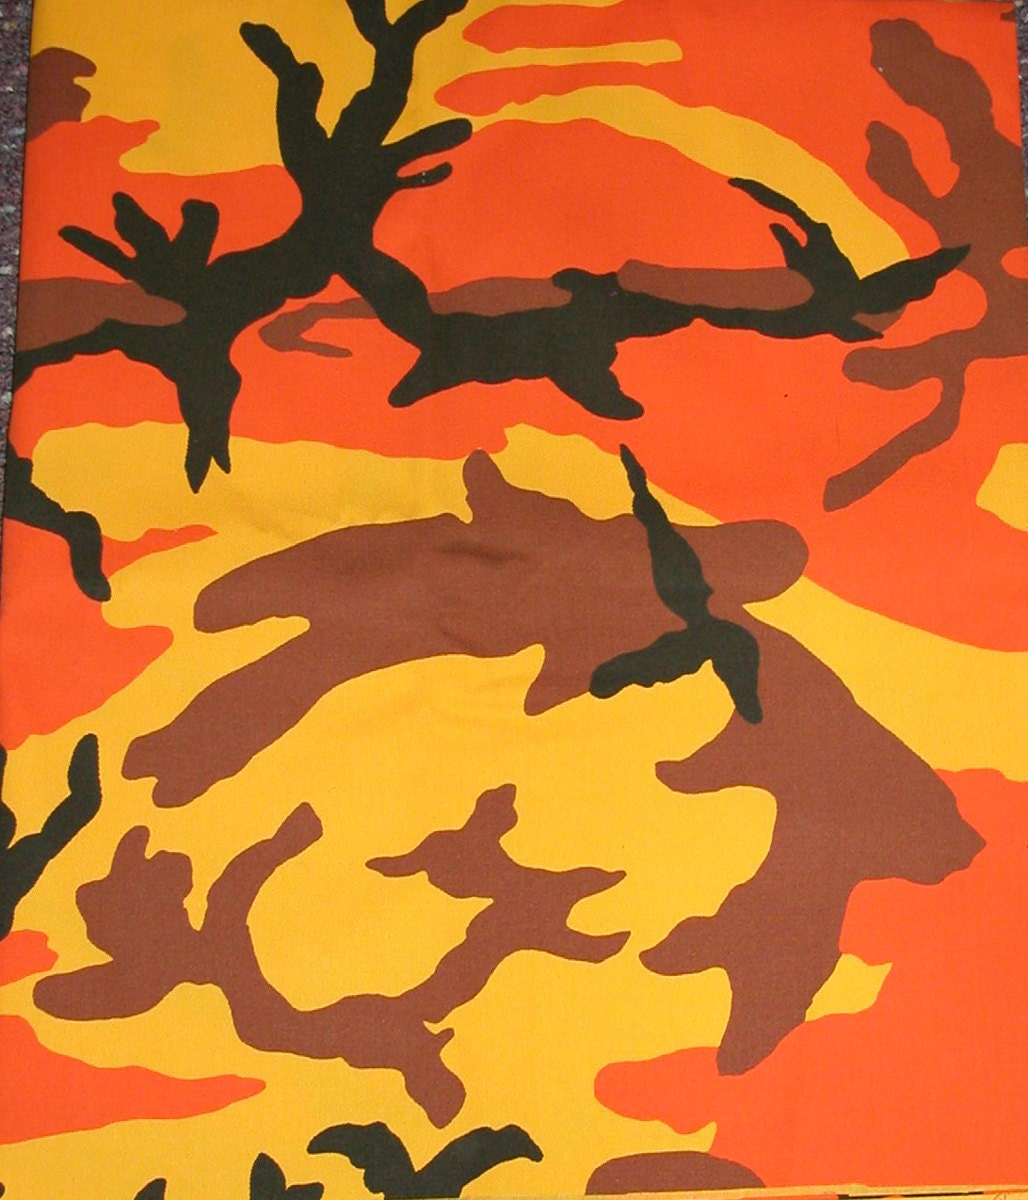 One Yard Of Bright Orange Camo Print Canvas Fabric 60 Inches